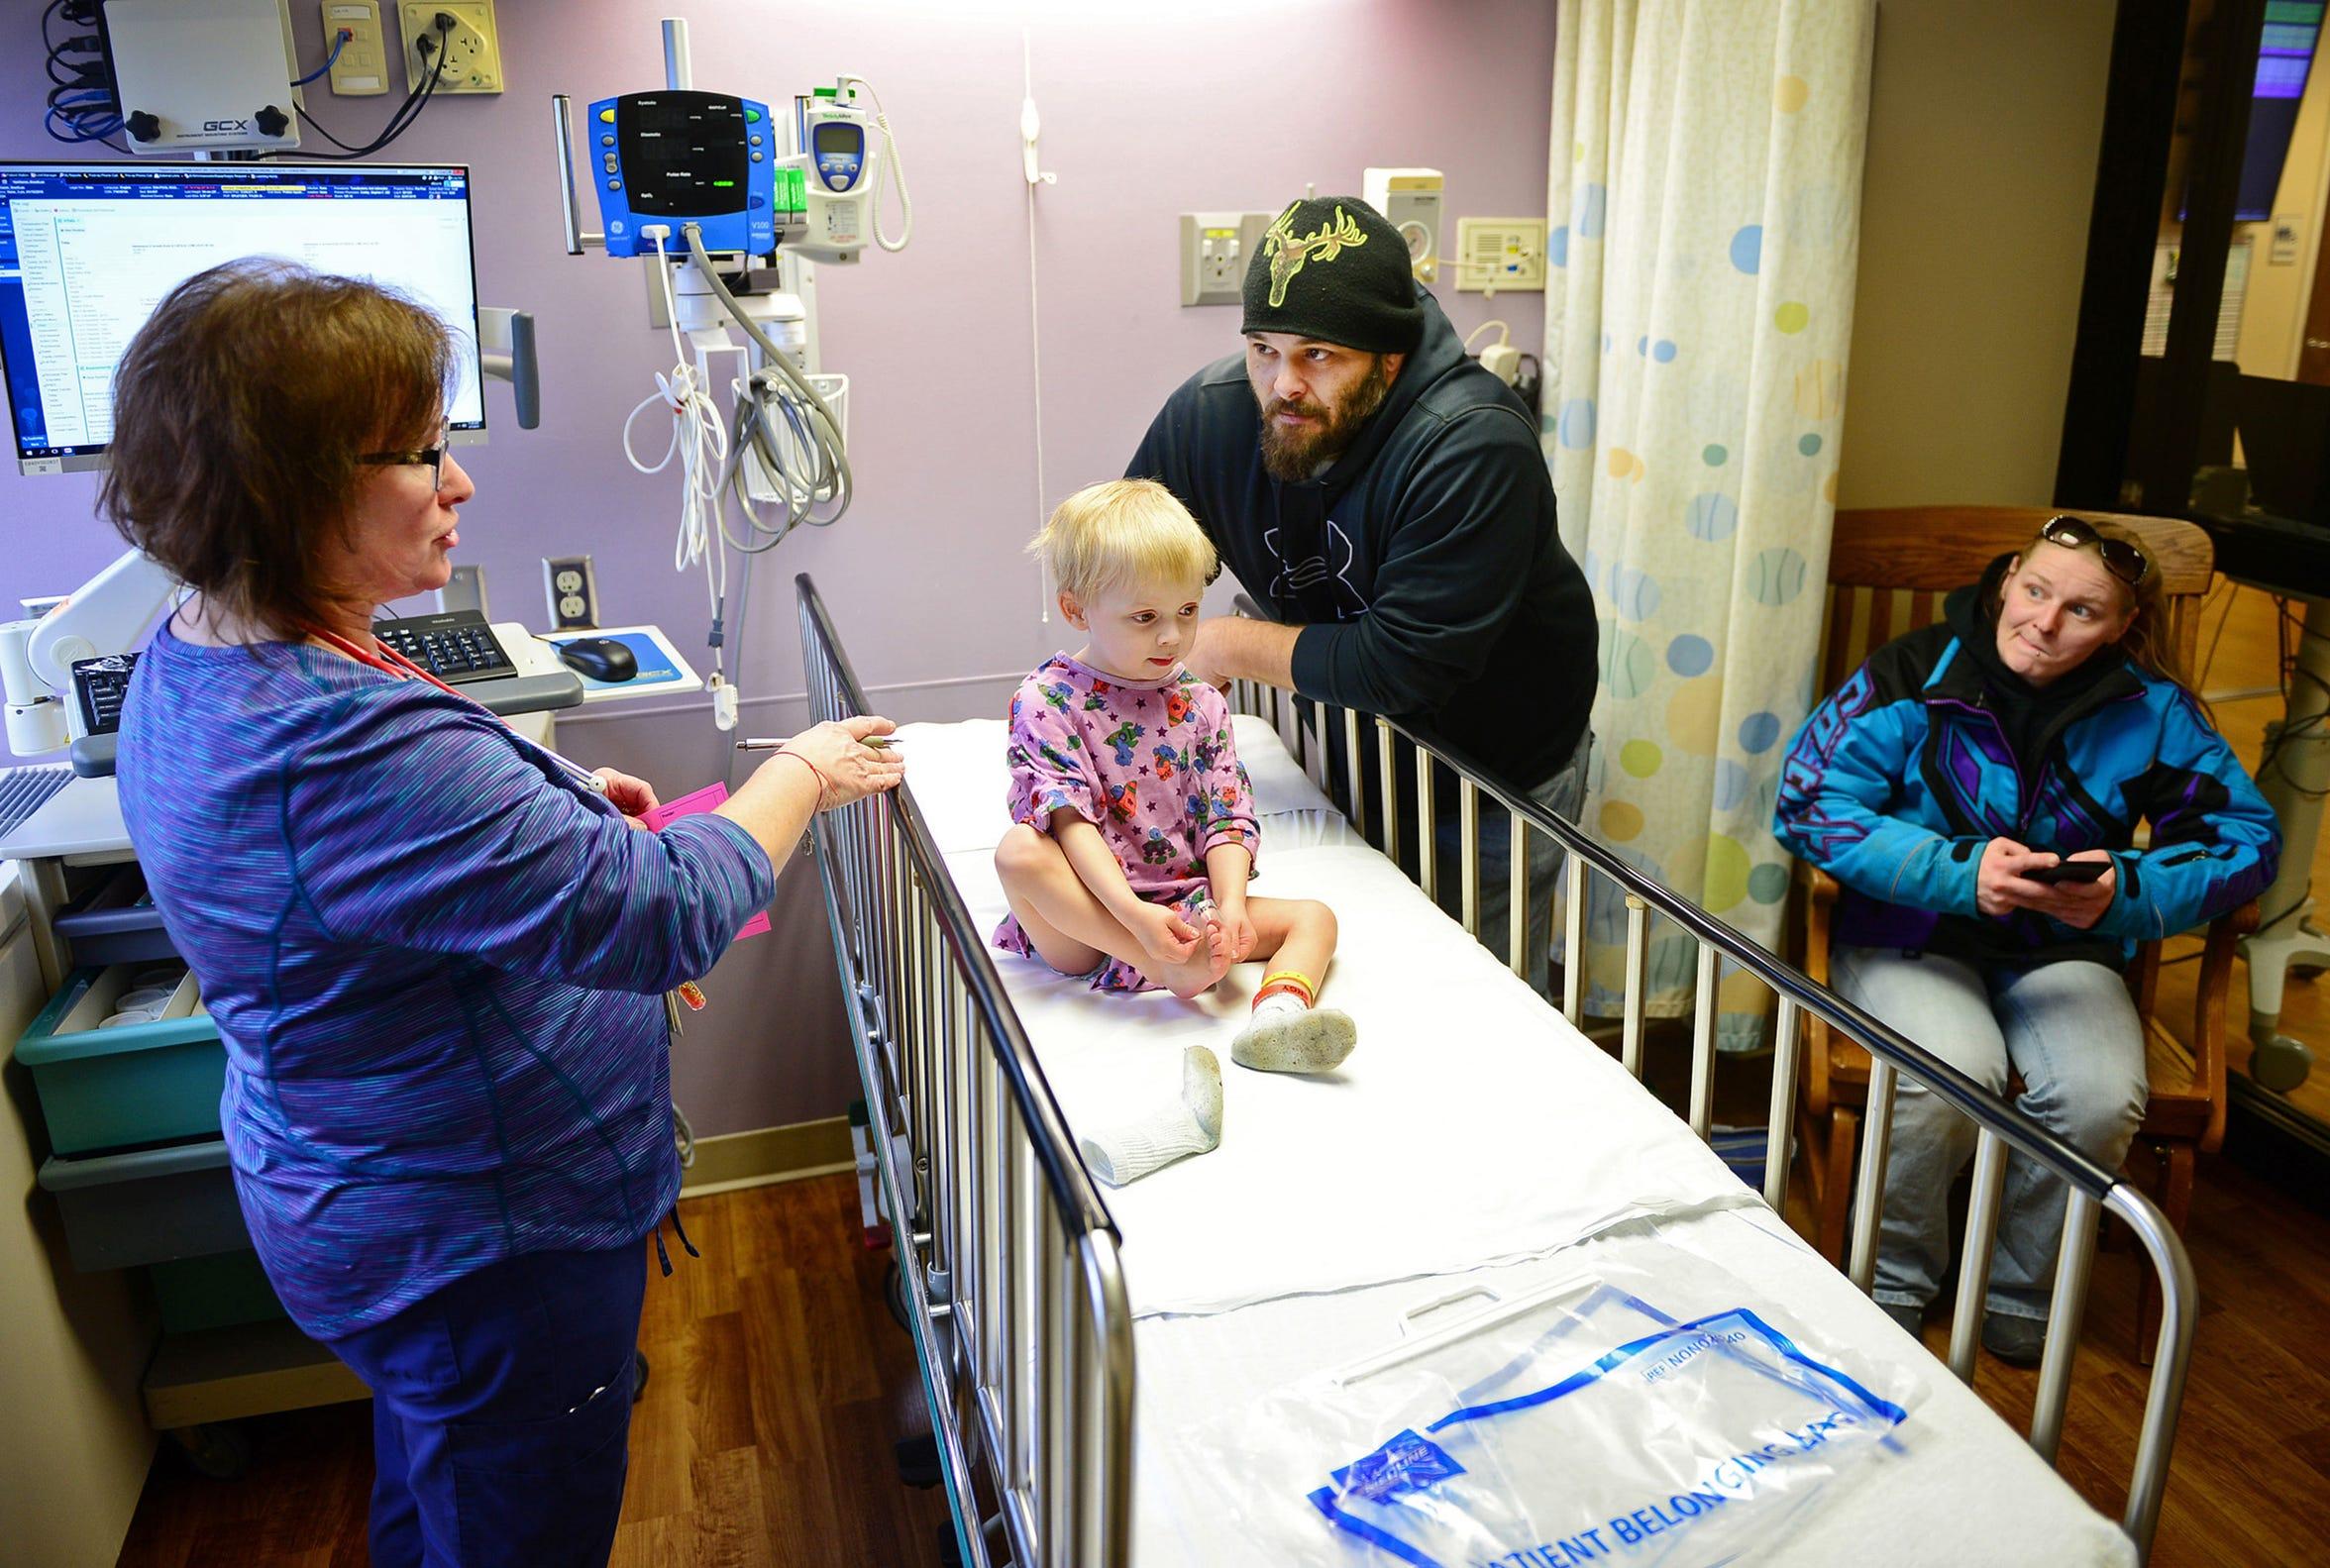 Nurse Kelli Kaminski checks in on BrentLee Van Haren during a follow-up care visit to Children's Hospital of Wisconsin on Feb. 7. His father, Robert, is beside him. Seated is BrentLee's mom, Chelsey Meverden.